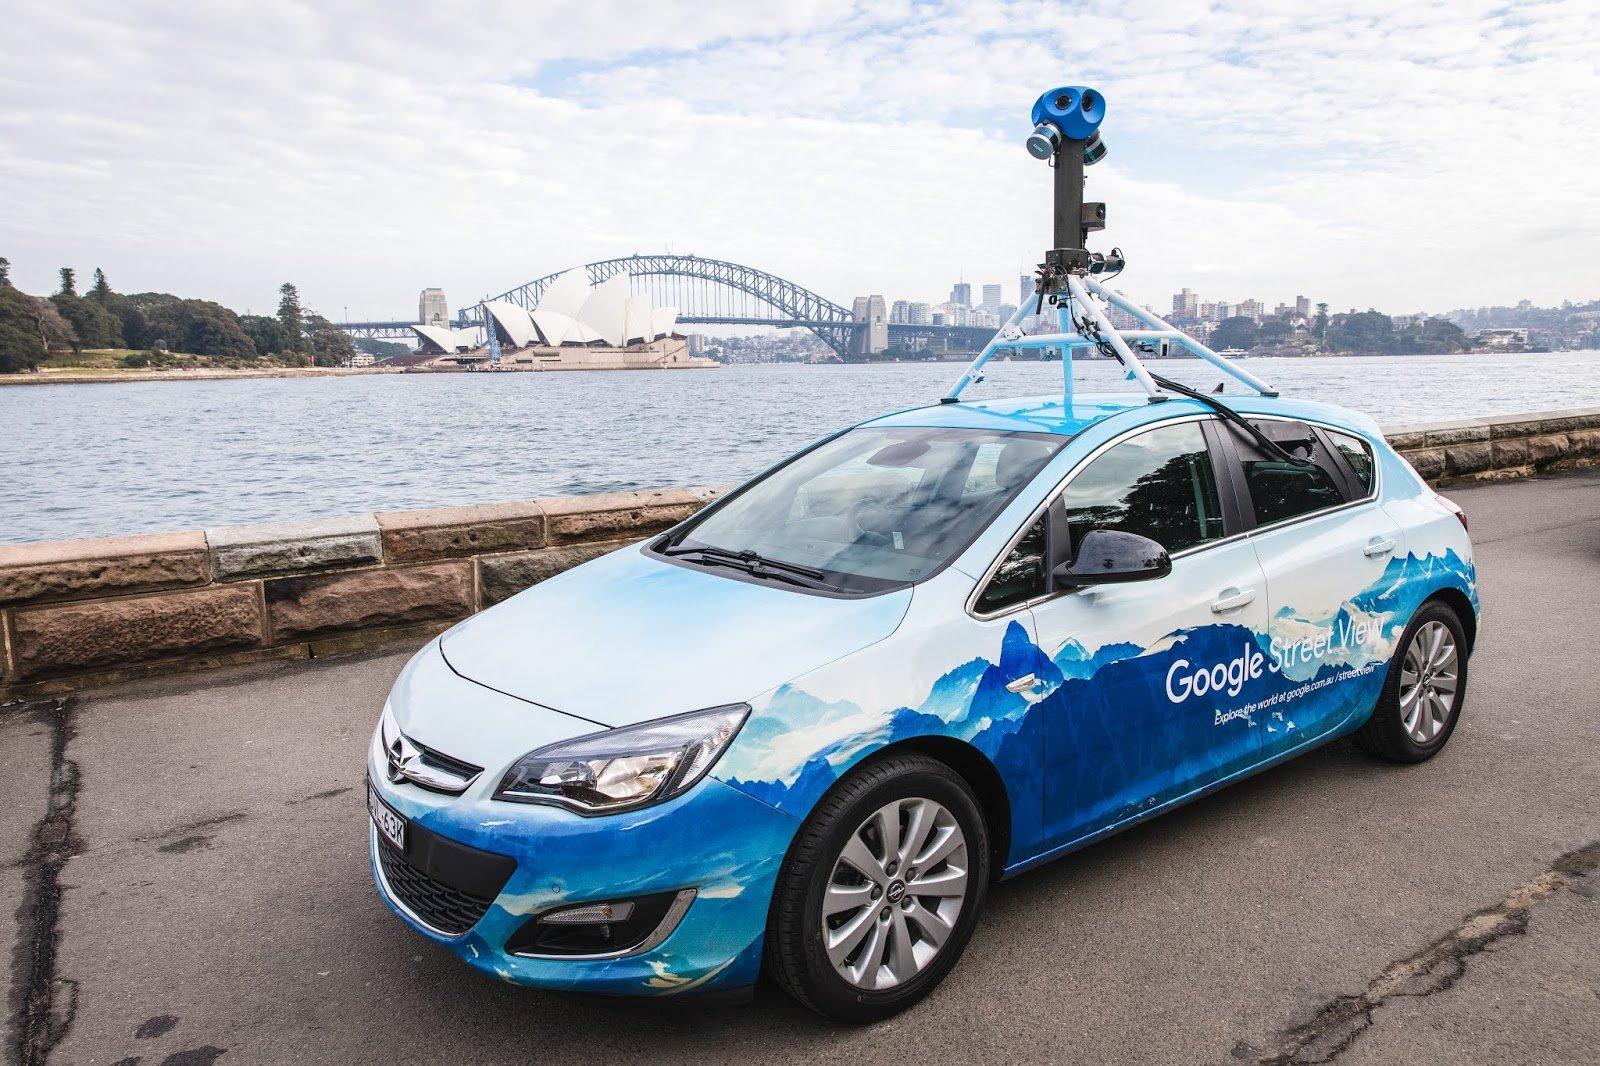 Auto di Google Street View